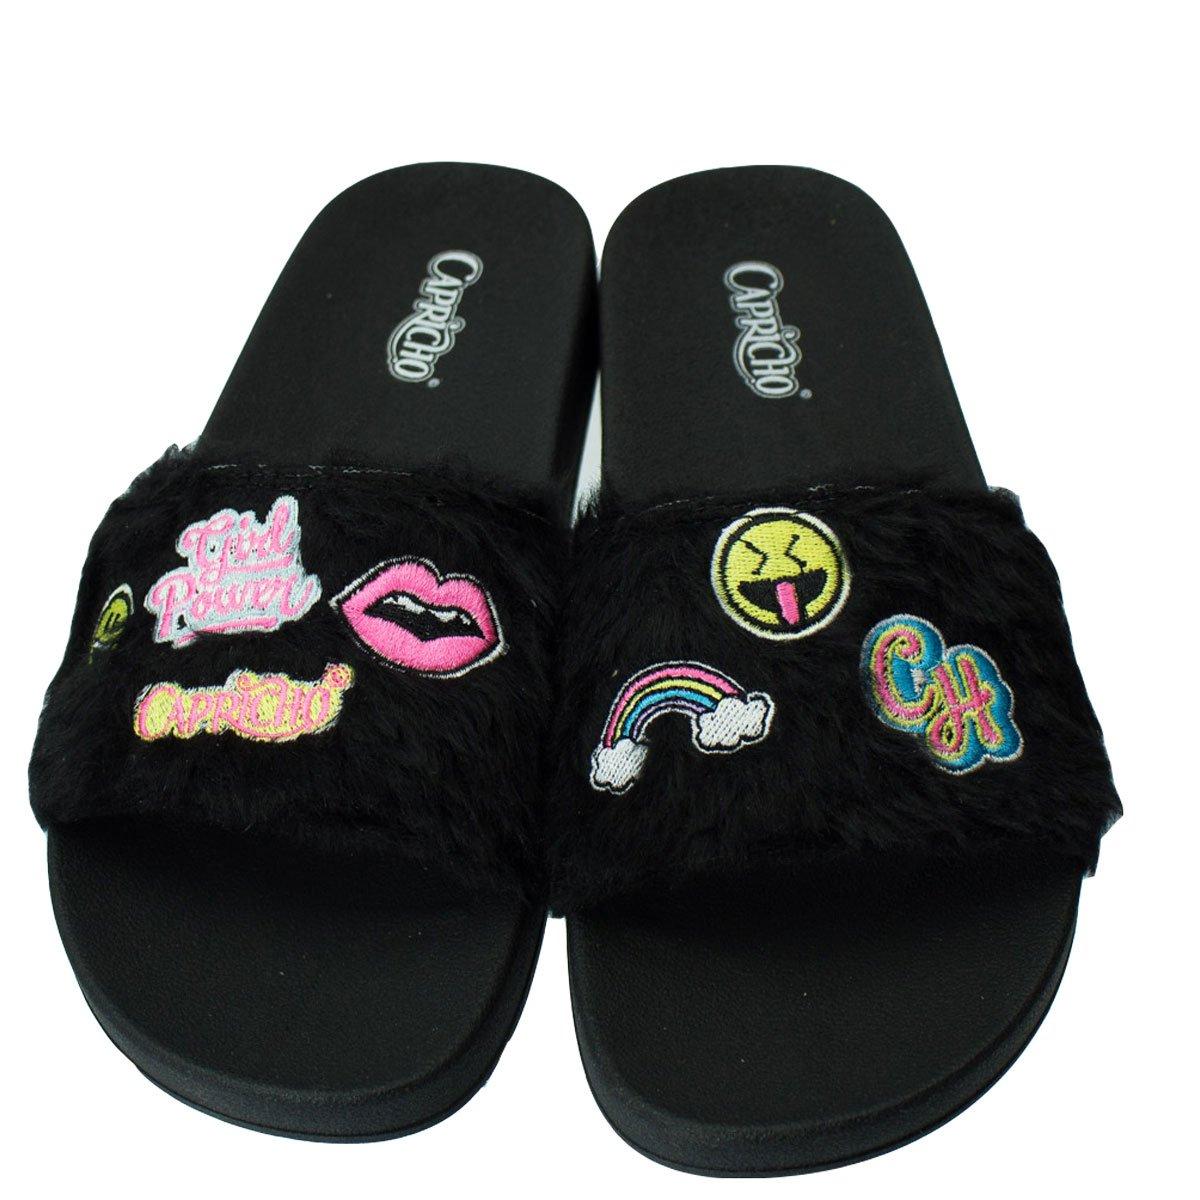 d0175494c0 Bizz Store - Chinelo Slide Feminino Capricho Pelo Patches